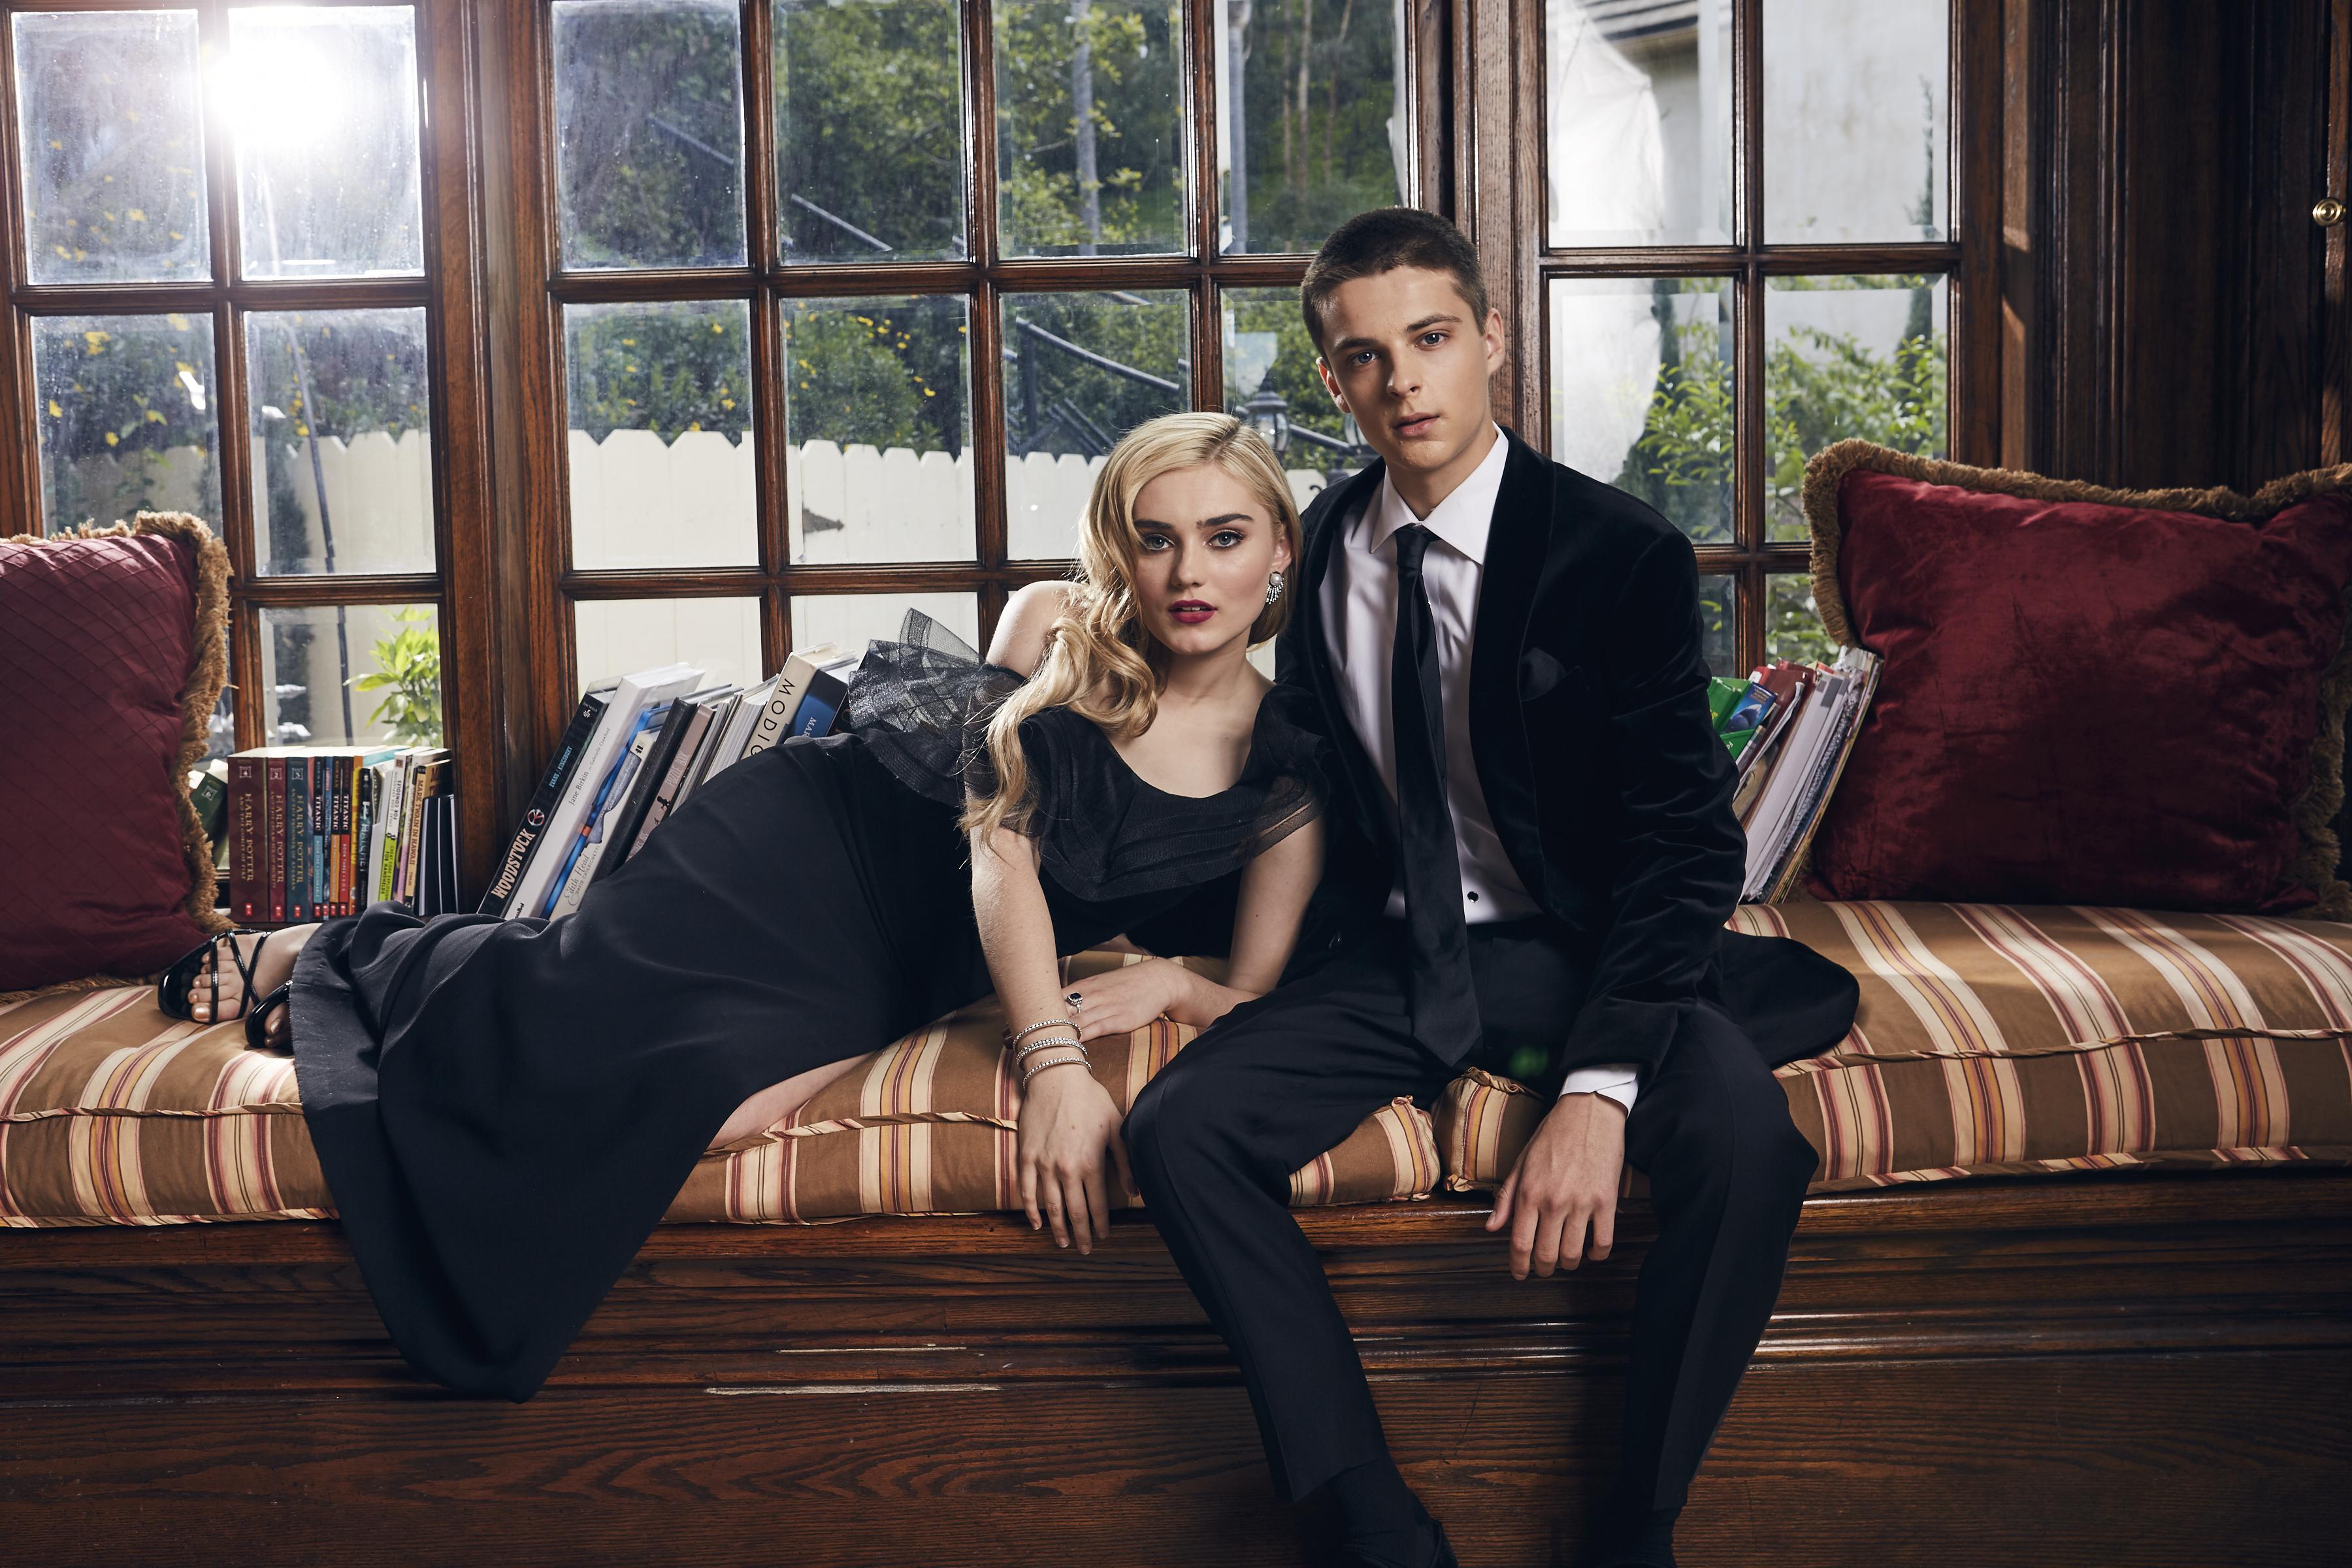 YSBnow Prom - Meg & Corey